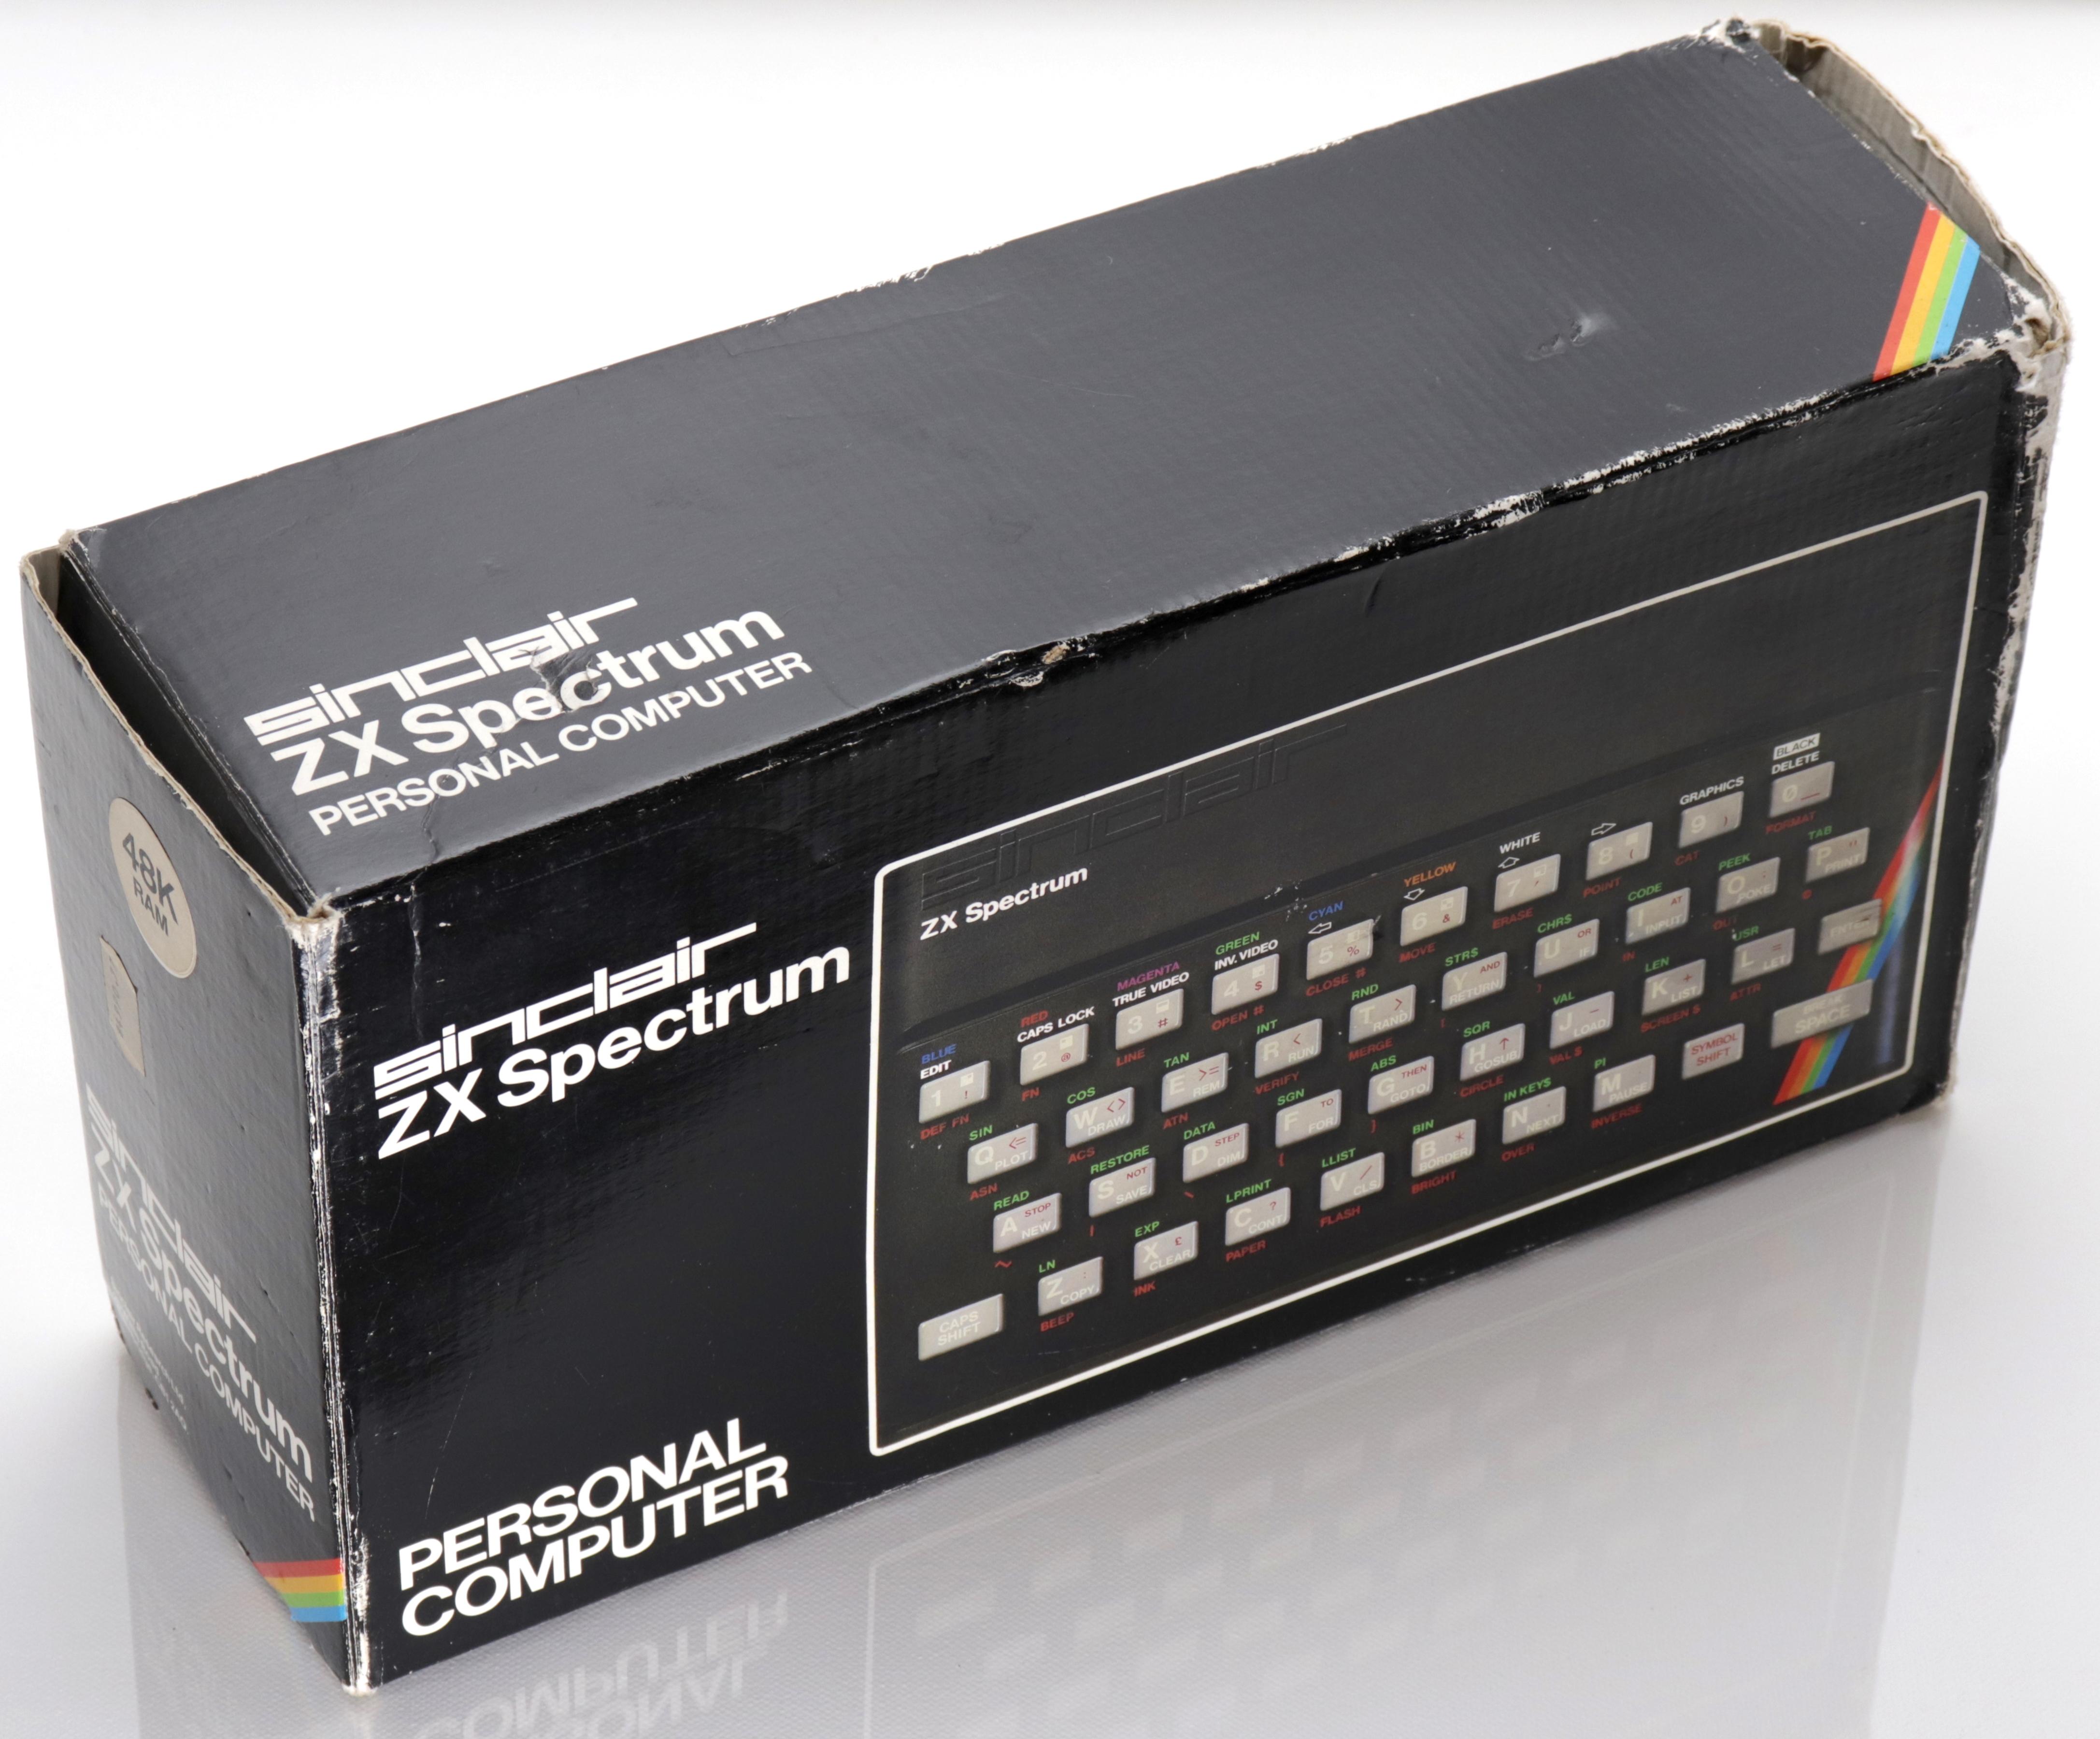 Spectrum doboz